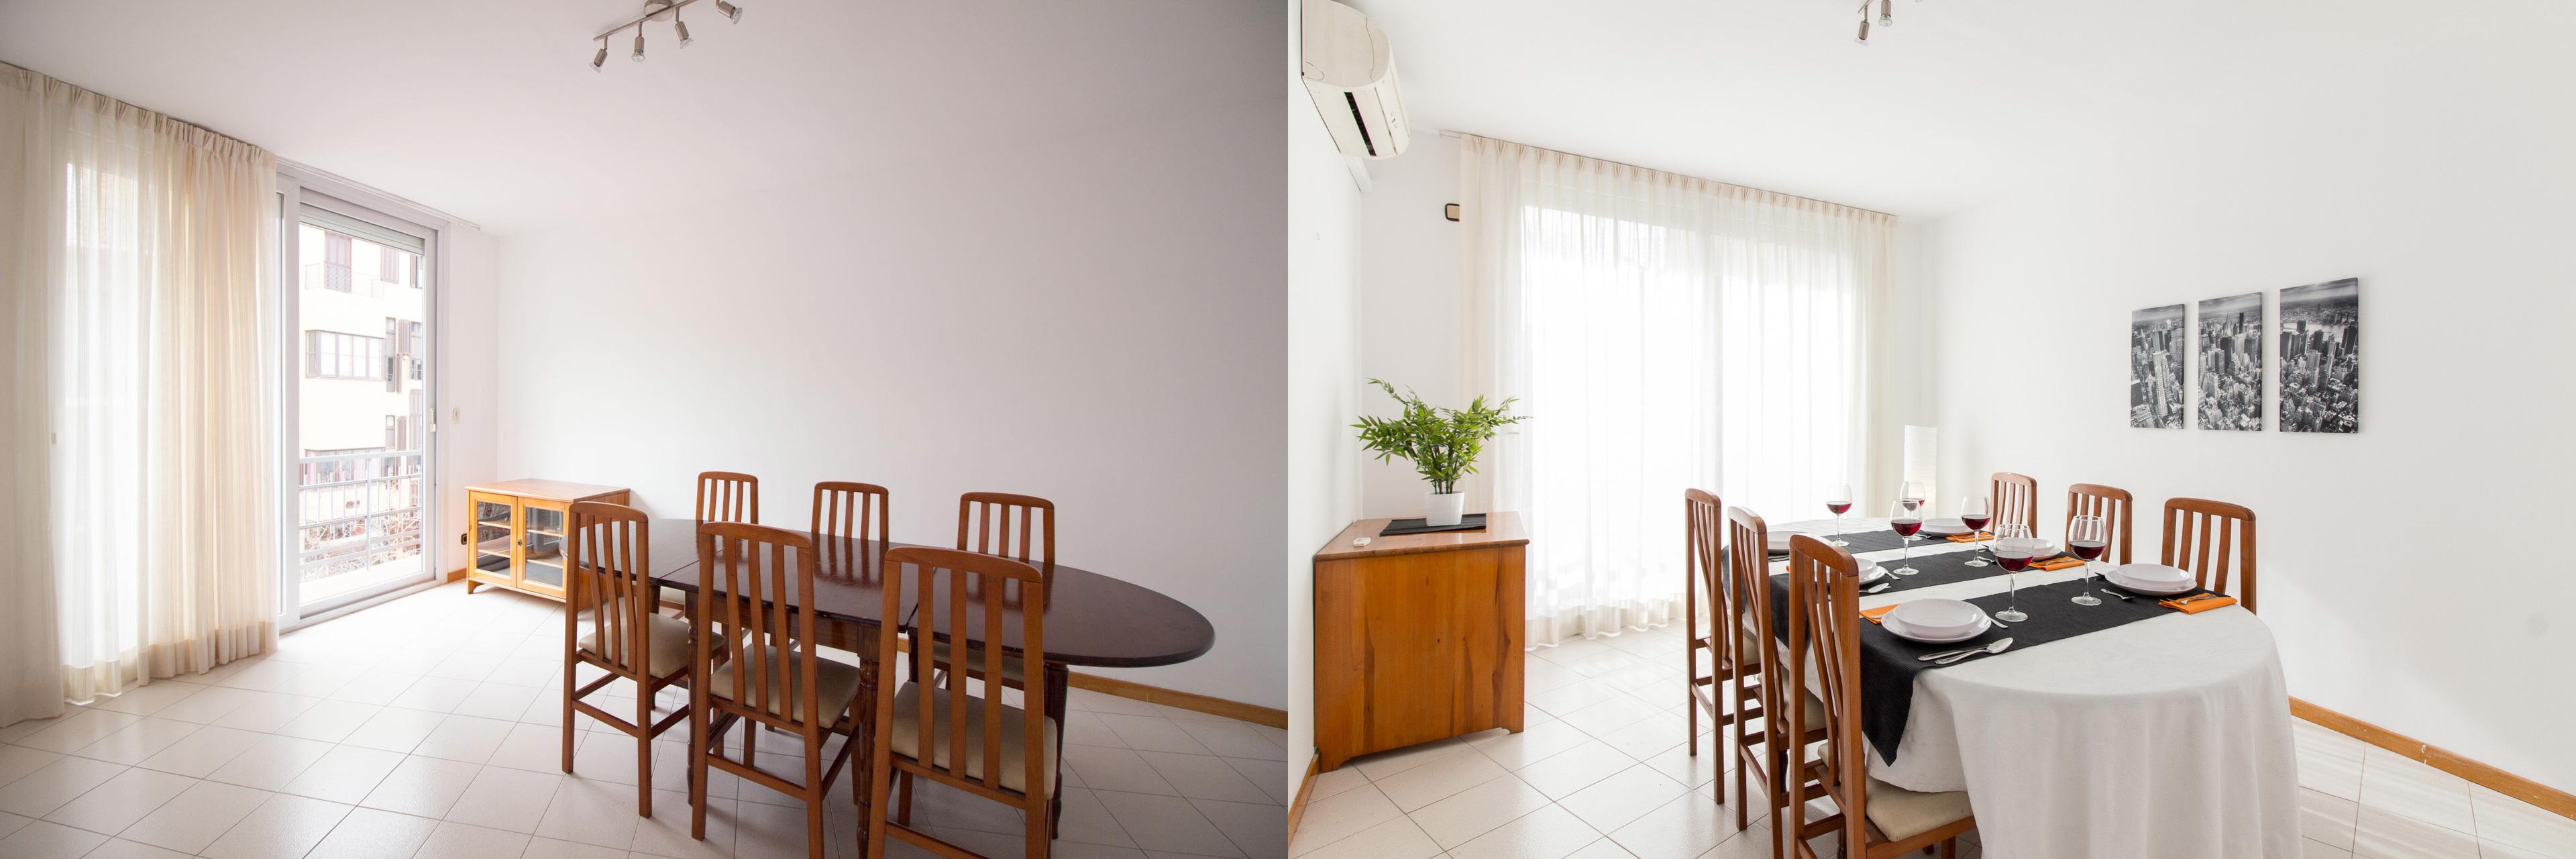 Proyecto Eixample Barcelona Impuls Home Staging